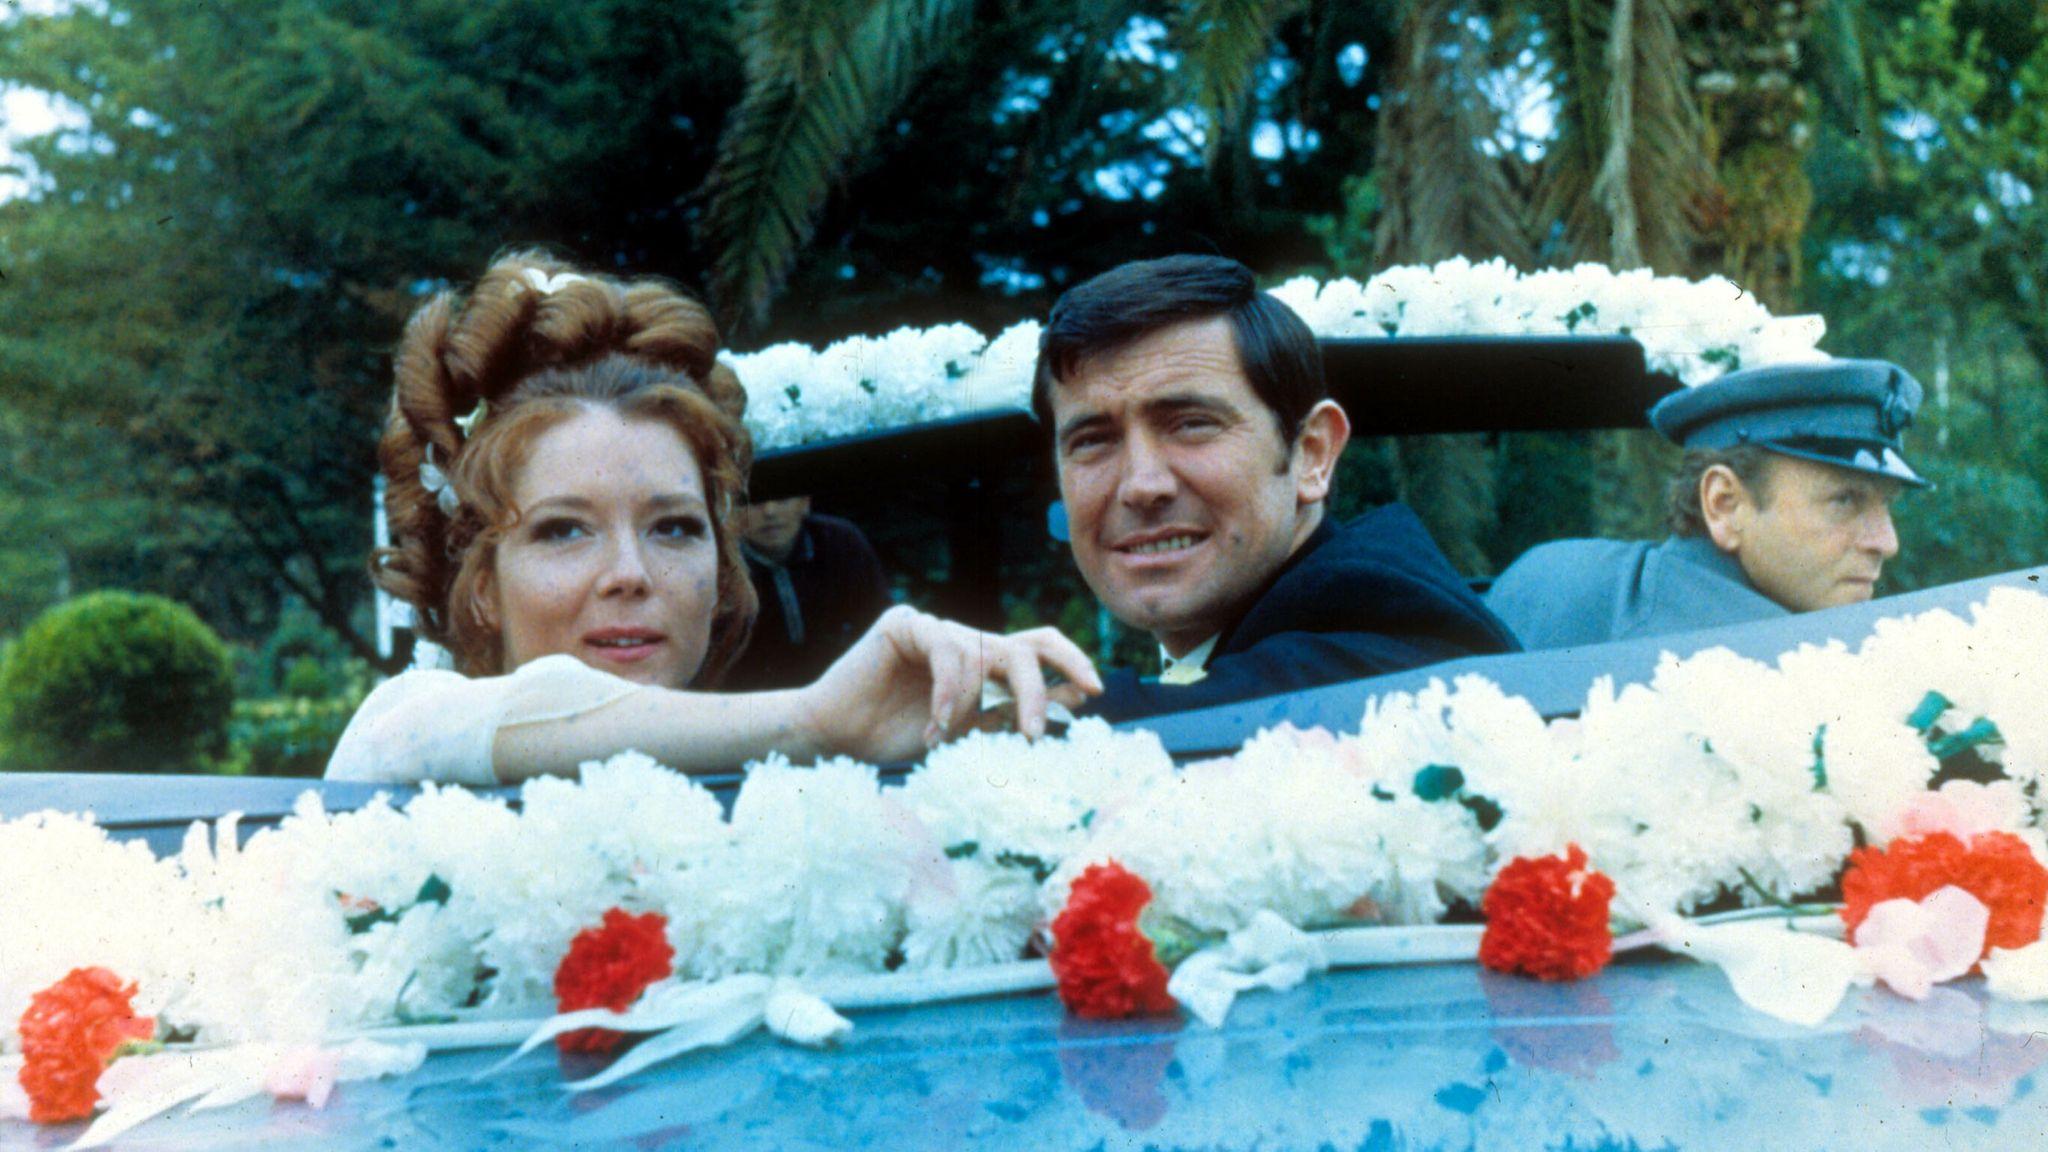 On Her Majesty's Secret Service, Diana Rigg, George Lazenby. Pic: Moviestore/Shutterstock